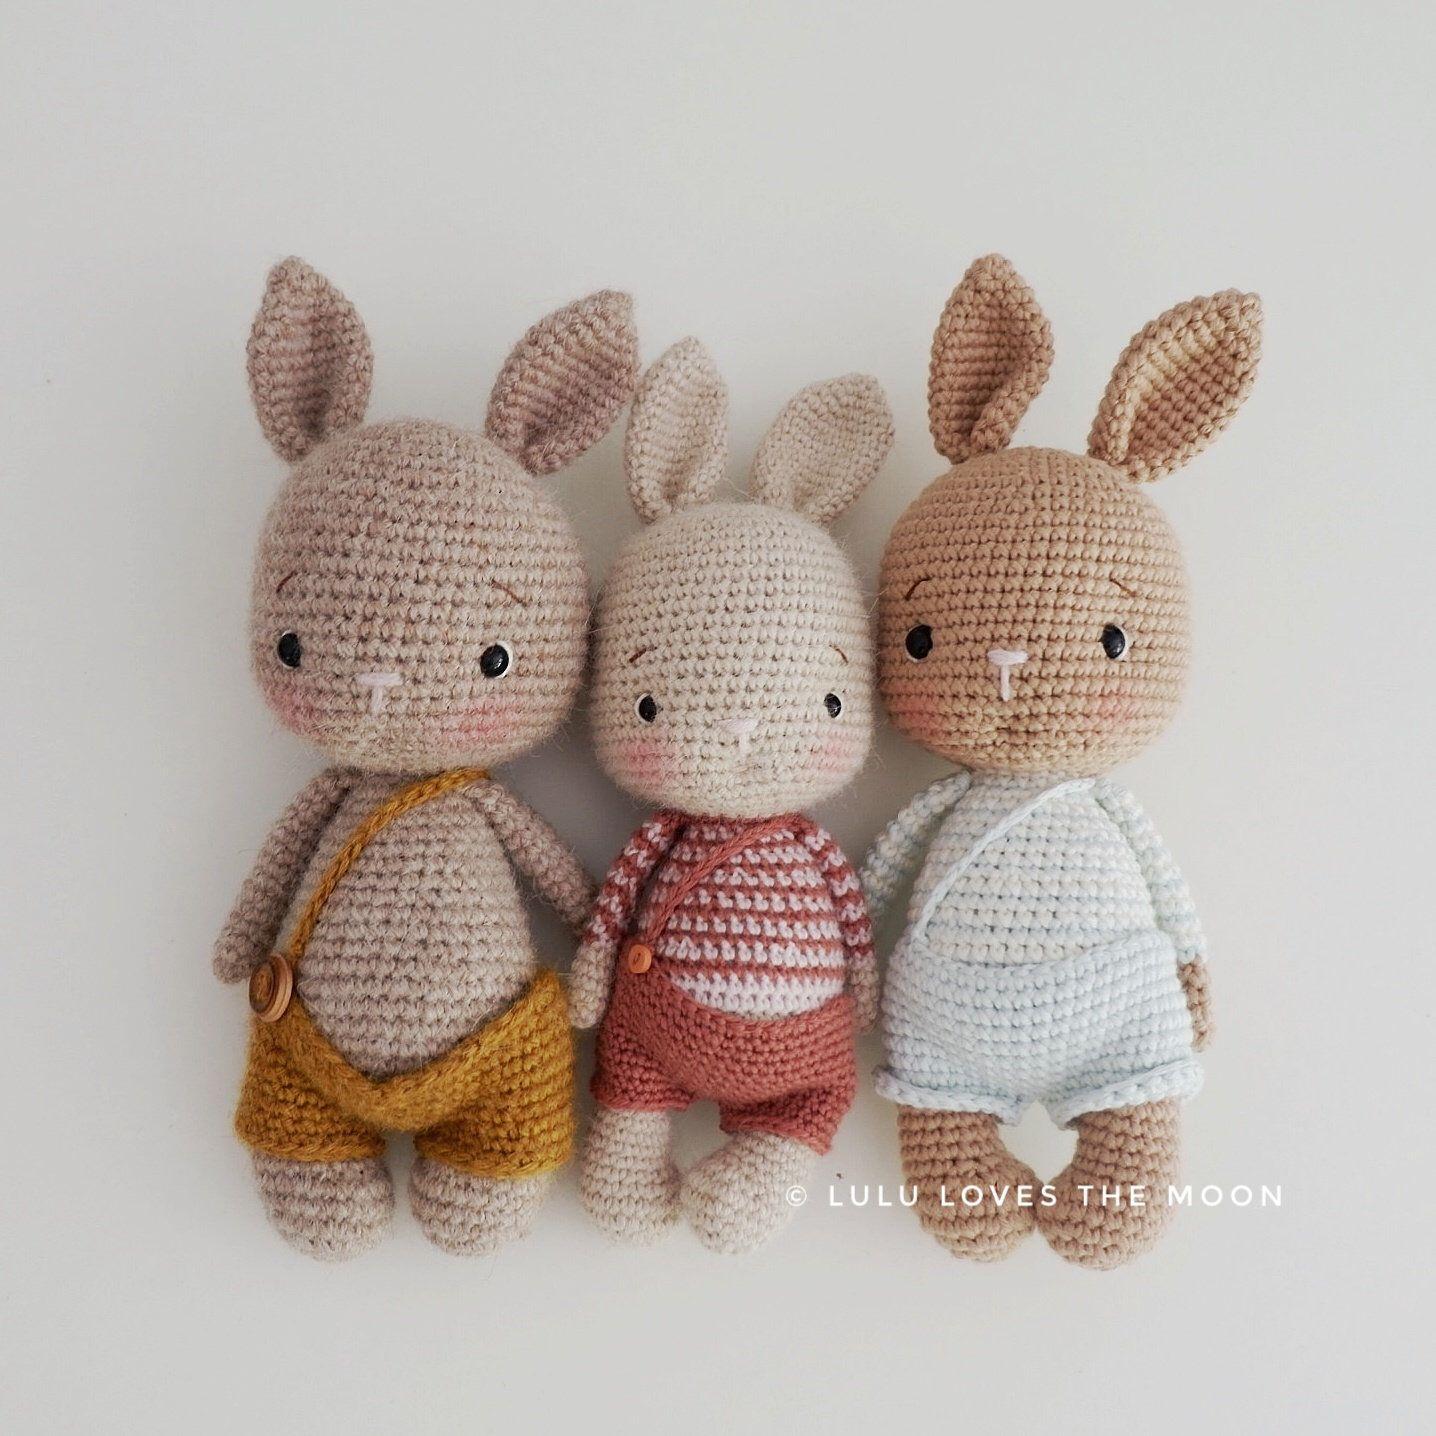 Bunny Pumpkin. crochet pattern Pumpkin, Häkelanleitung, deutsch, english, patron francais, espanol, häkeln, Hase, Amigurumi, Kuschelhase